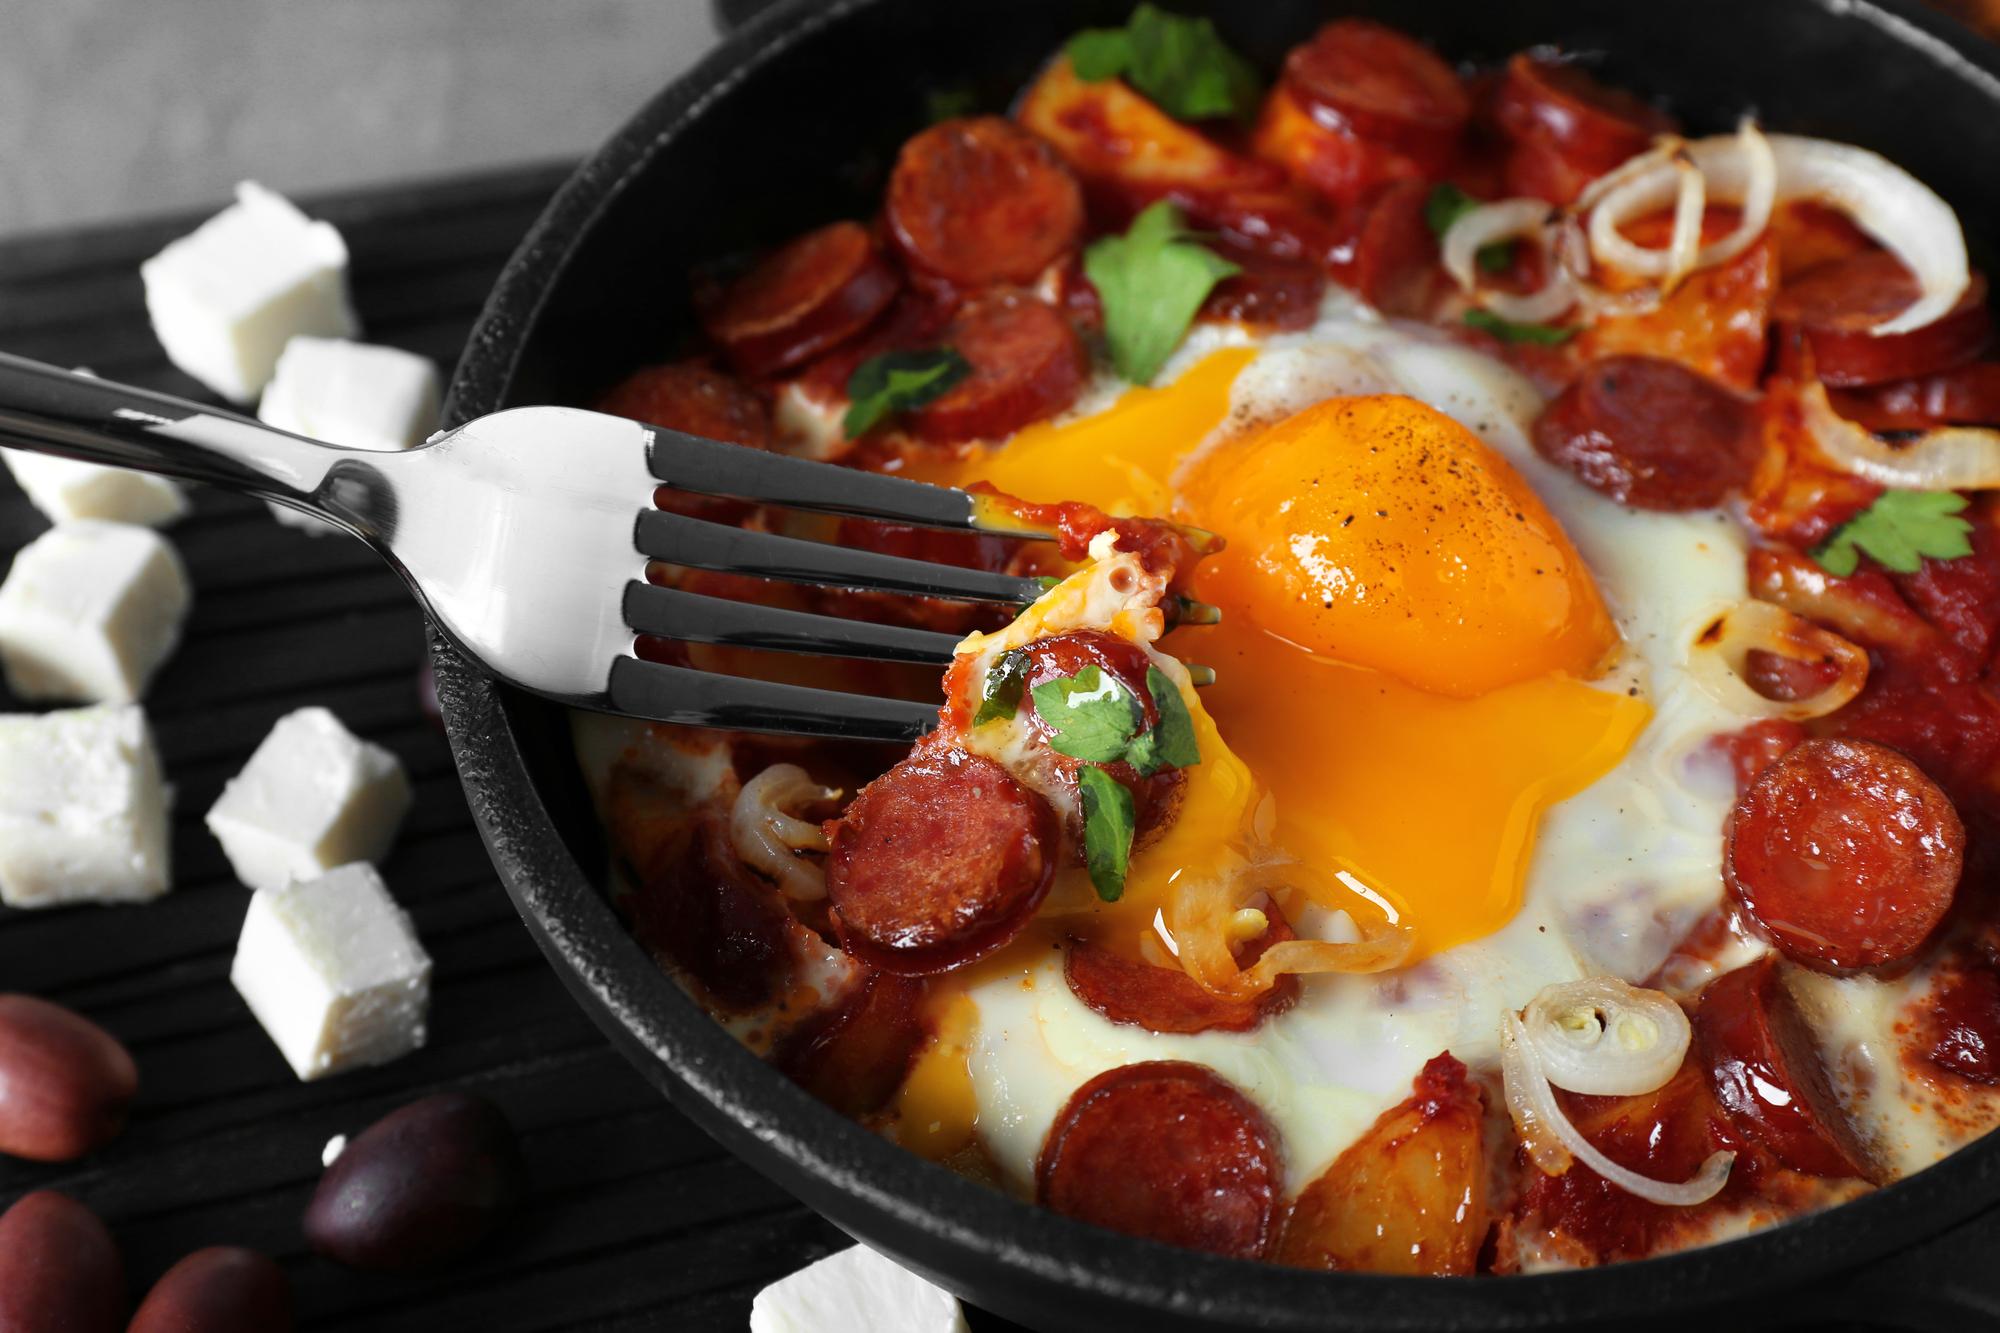 Яичница на завтрак с копченостями